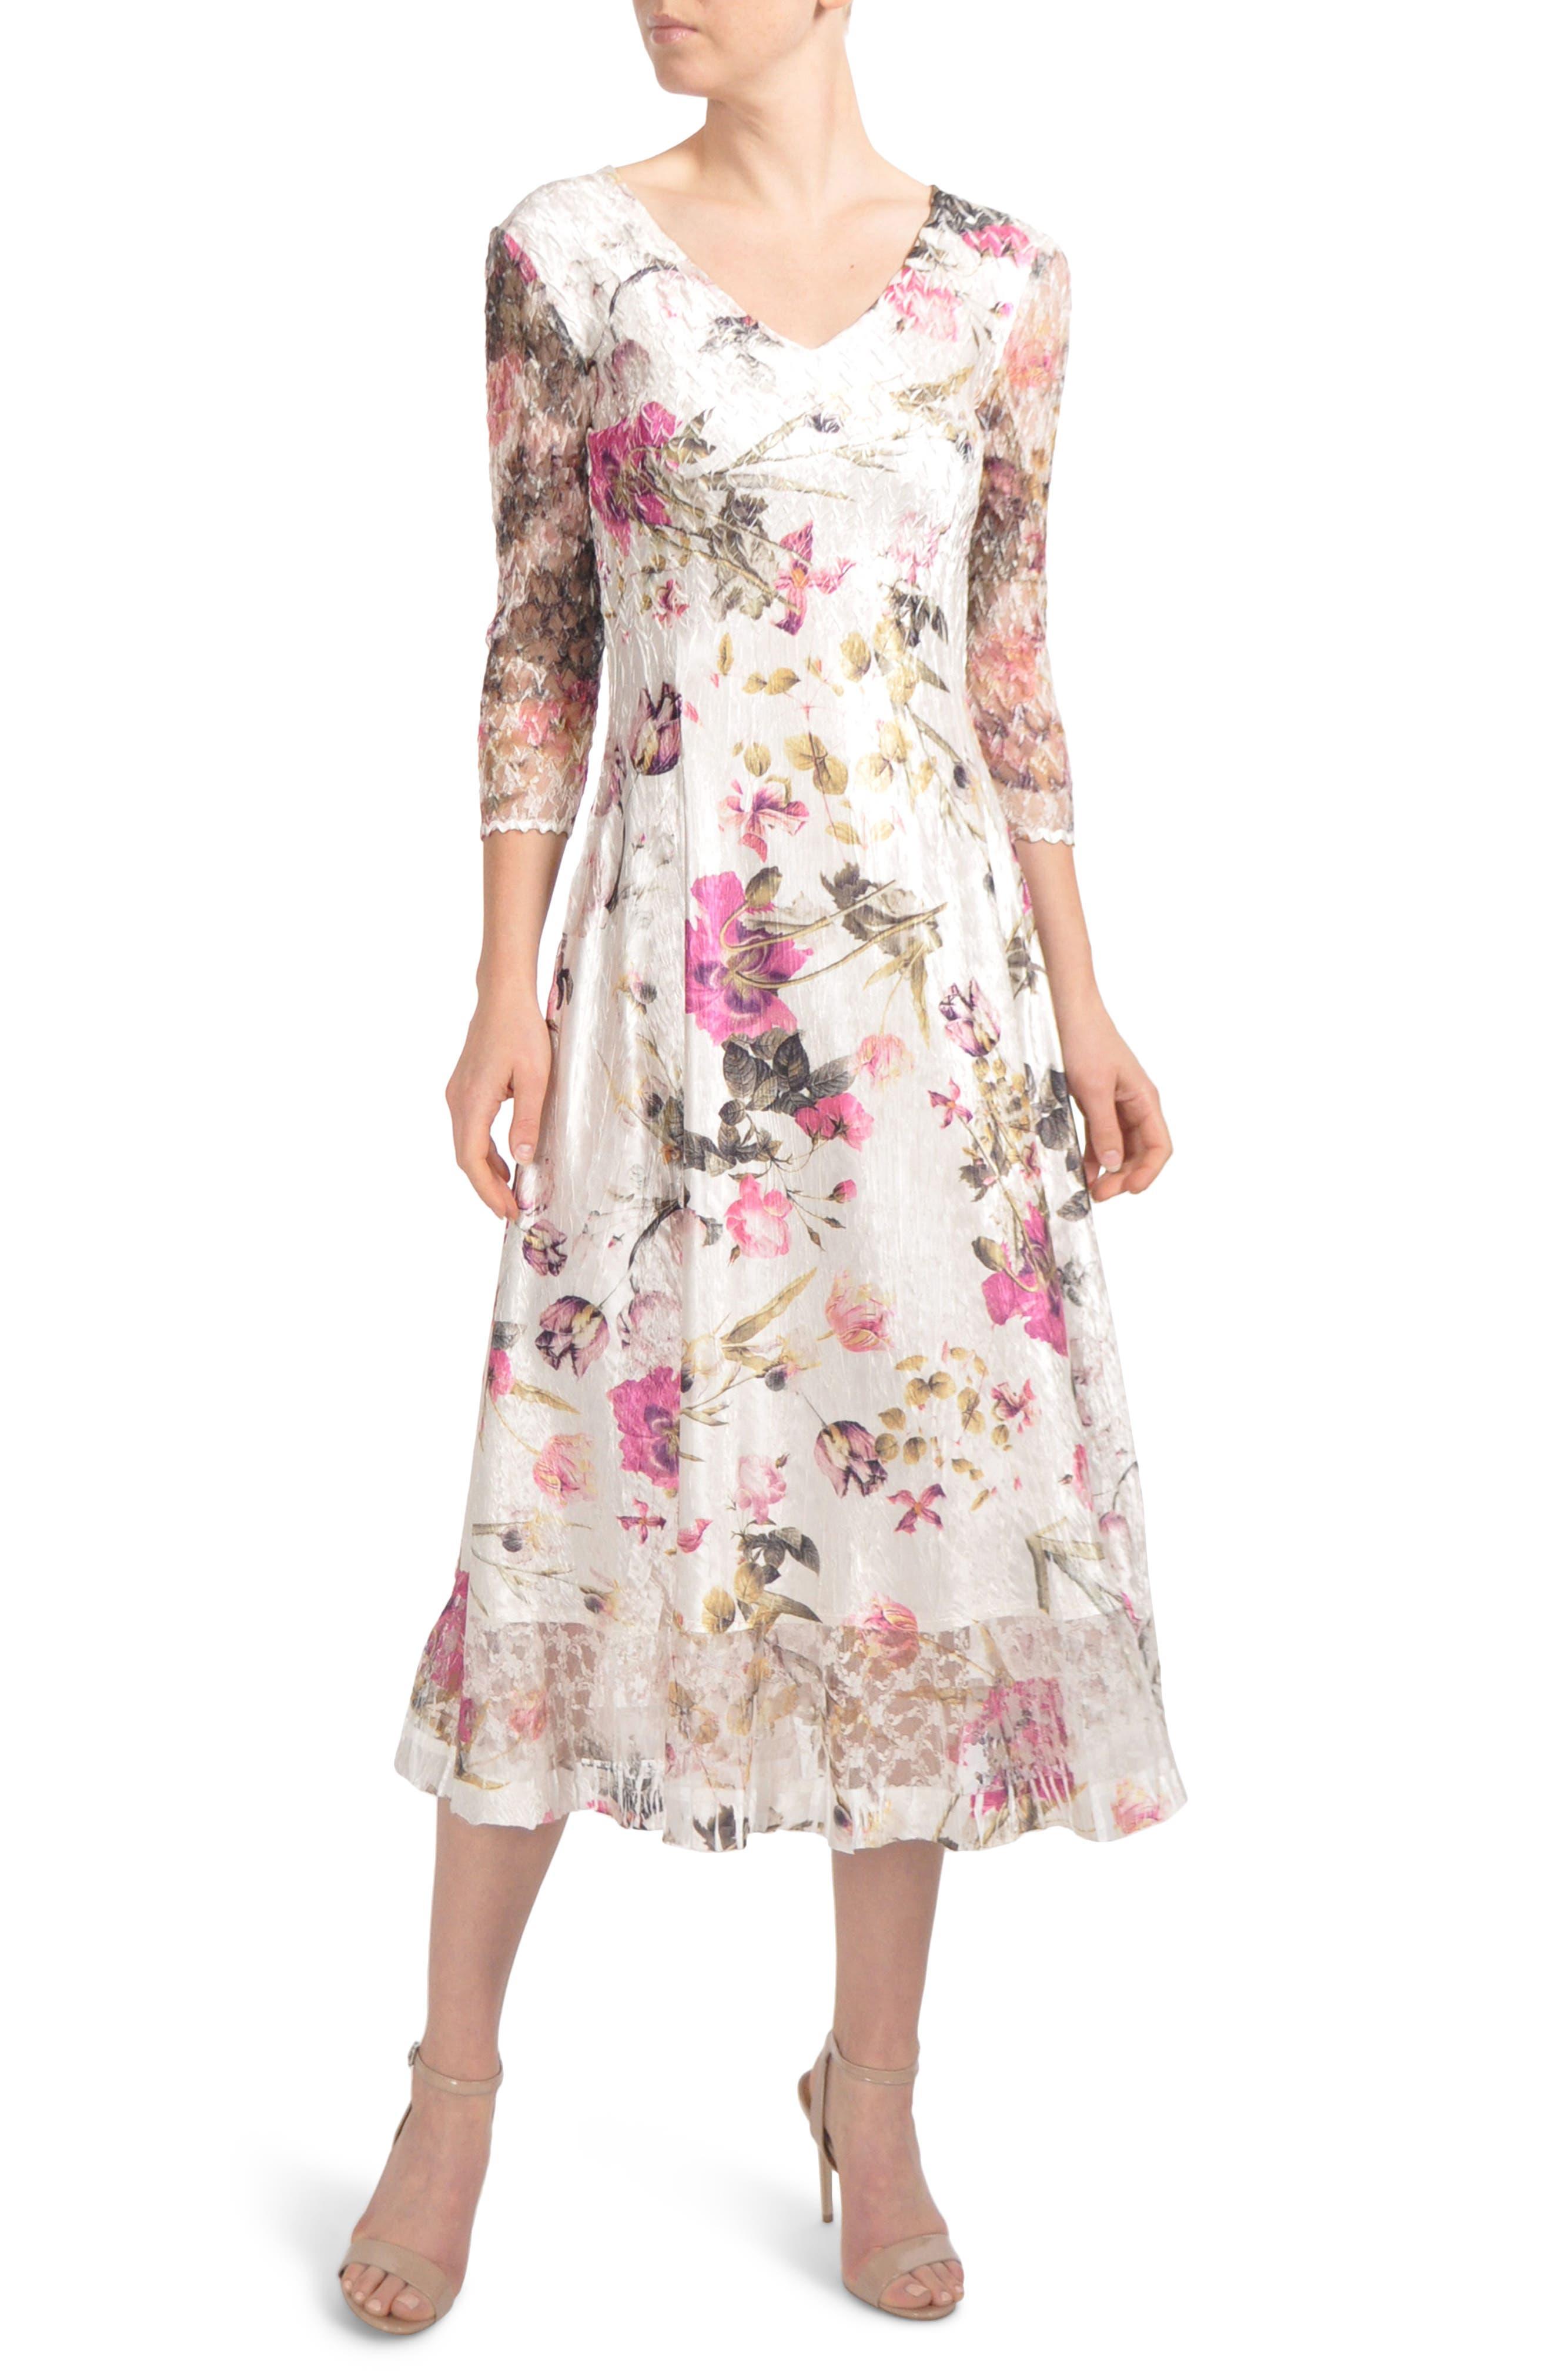 Petite Komarov Chiffon & Charmeuse Dress, Beige